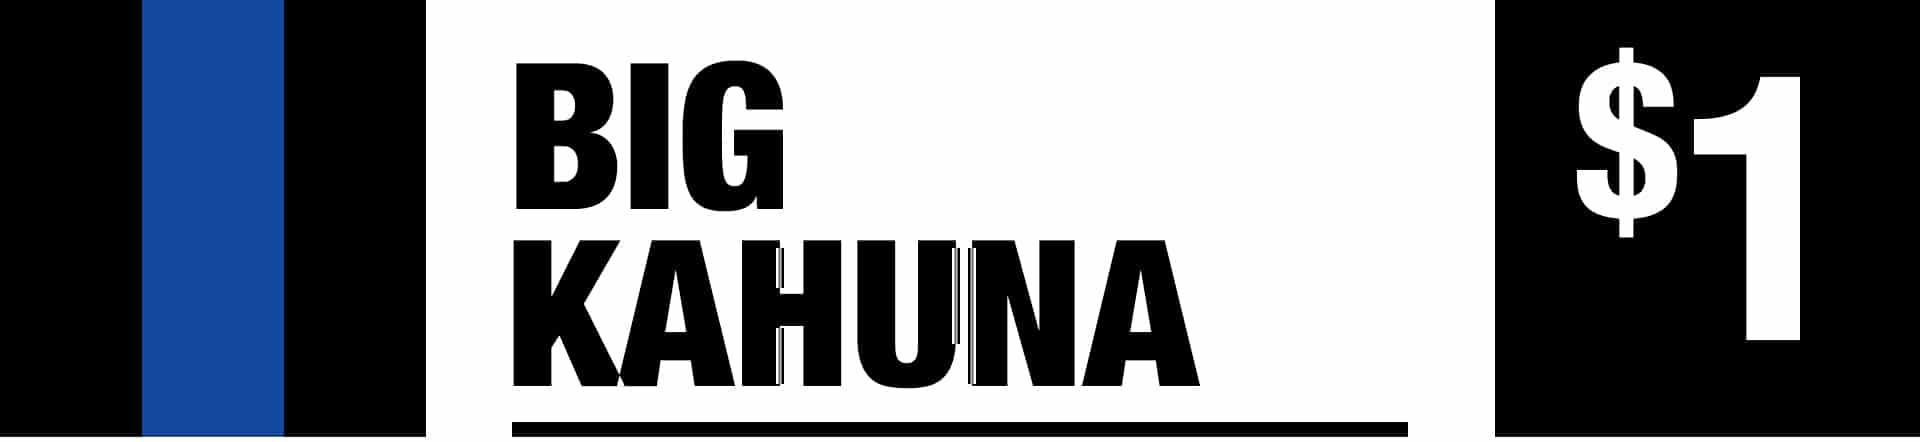 Big Kahuna - One Dollar Jackpot